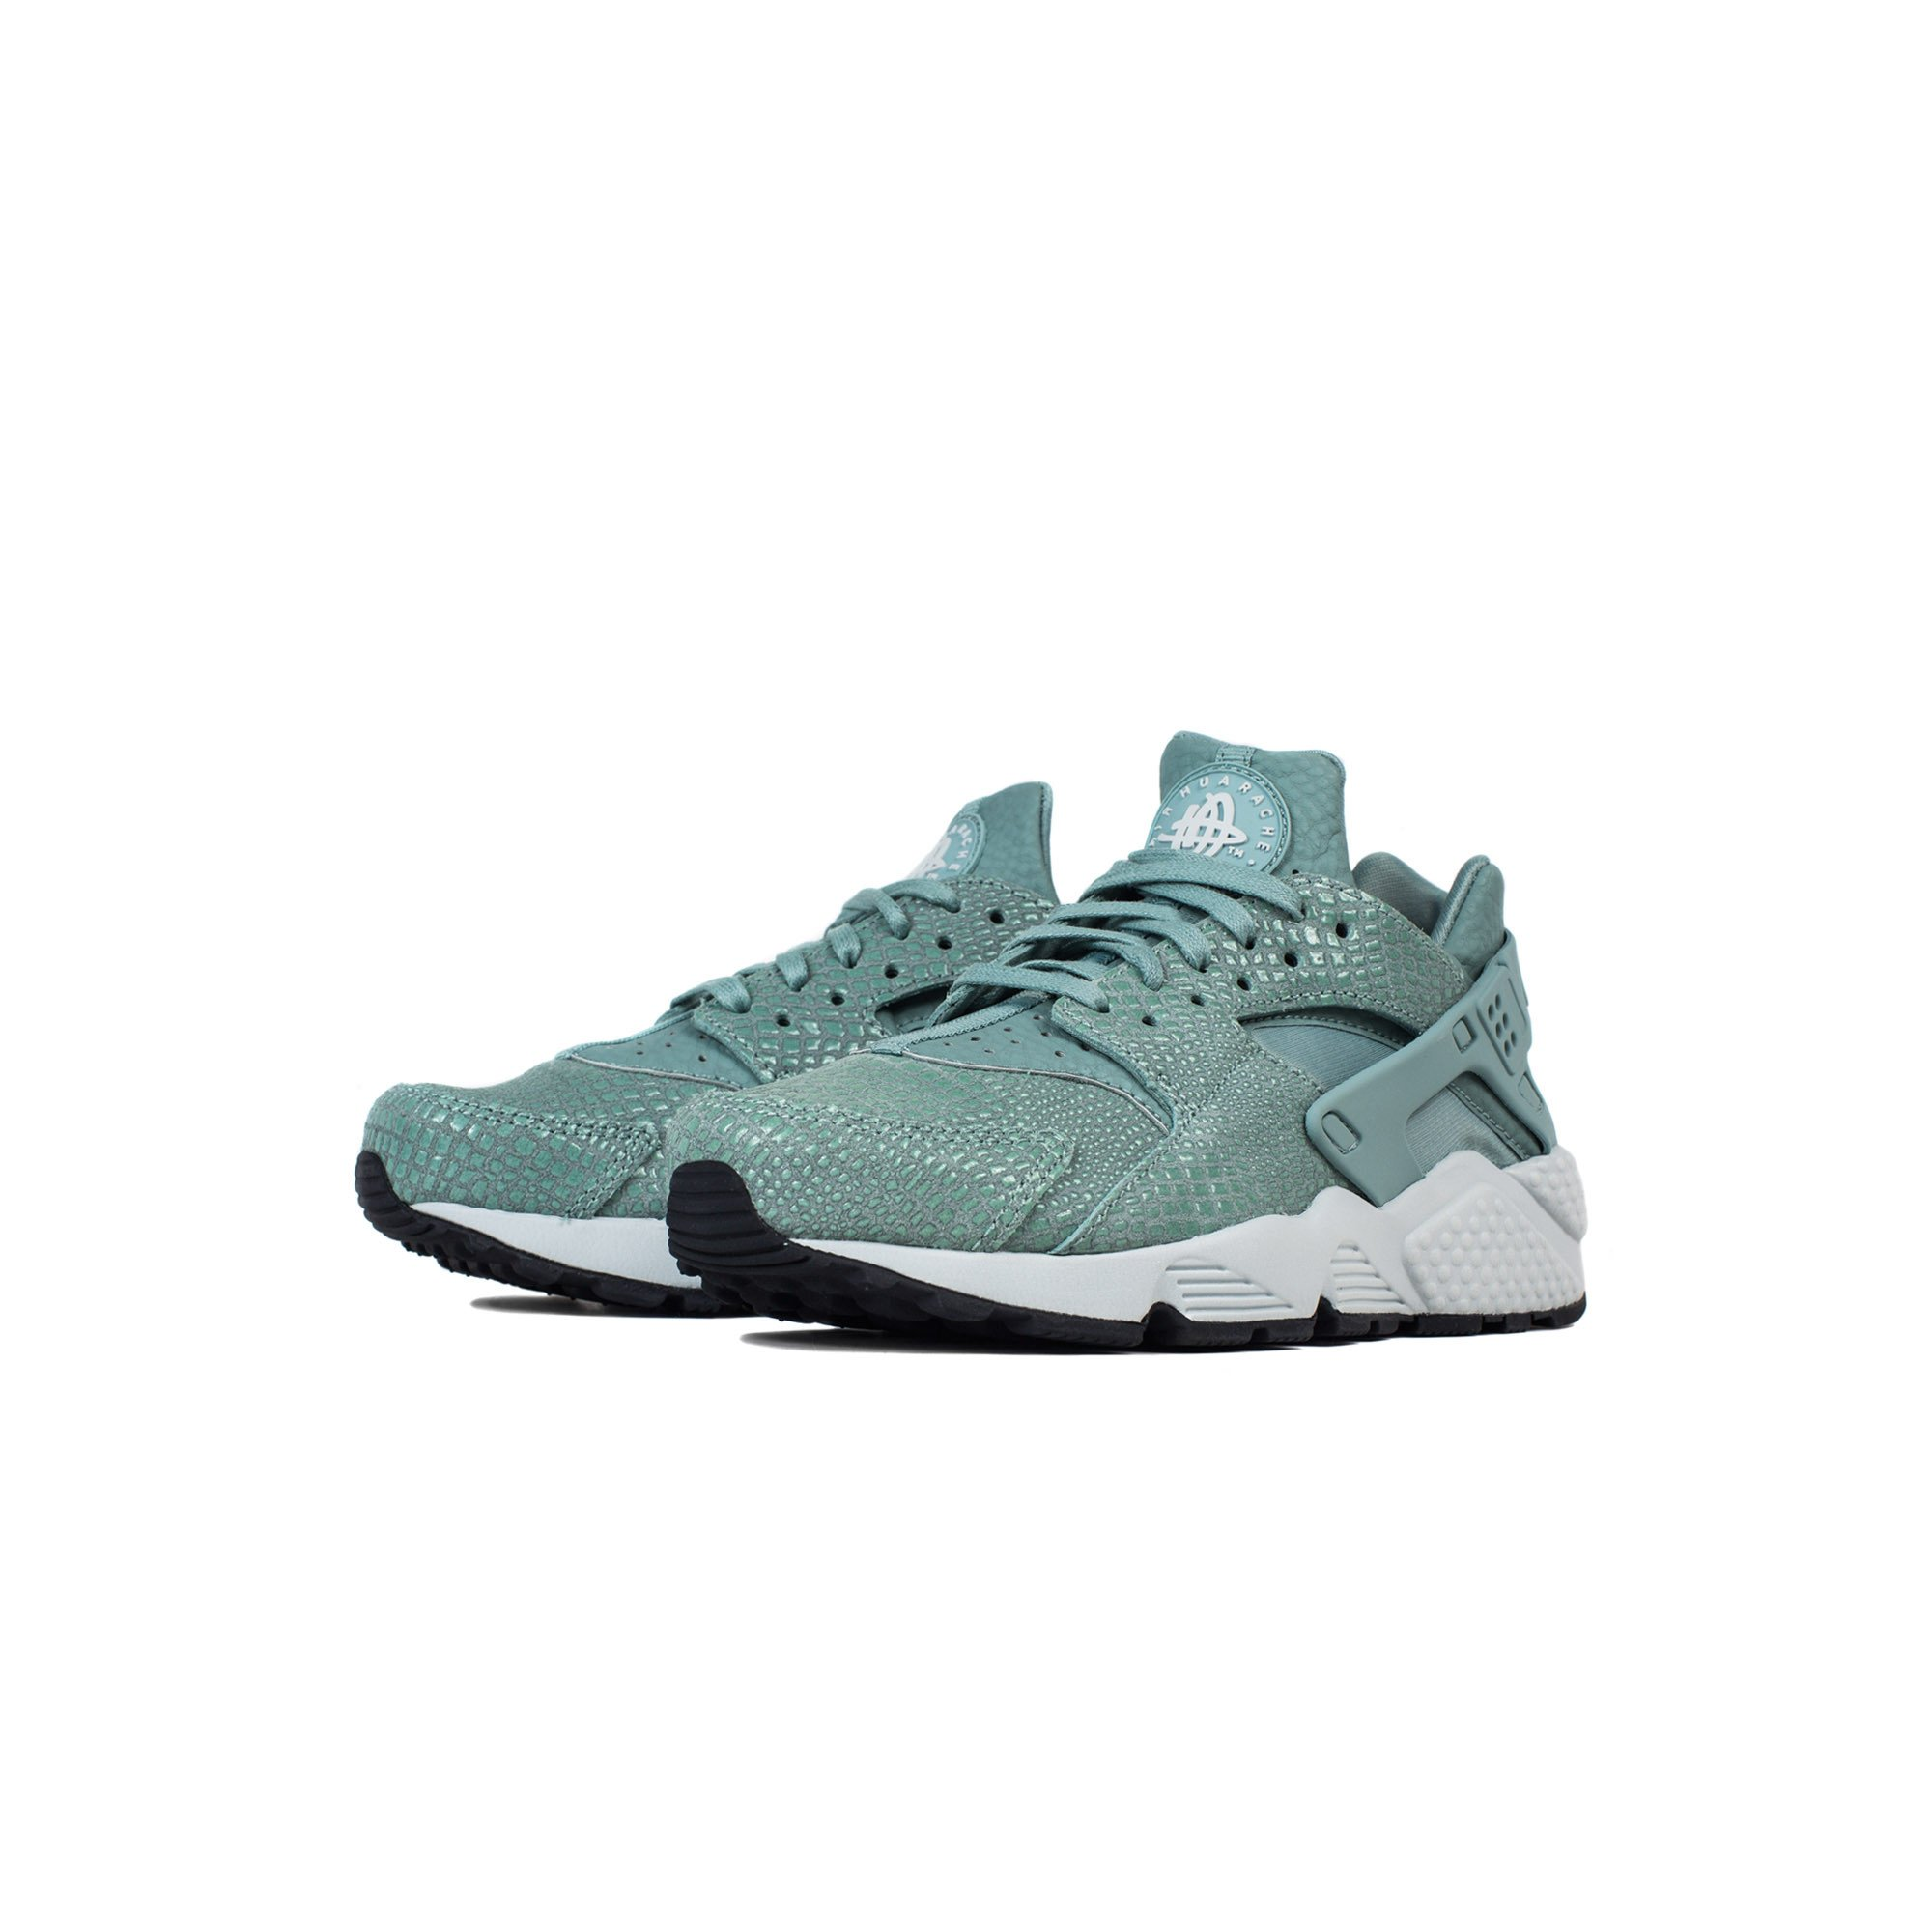 6c75da557645 Galleon - Nike Womens Air Huarache Run Print Running Trainers 725076  Sneakers Shoes (US 9